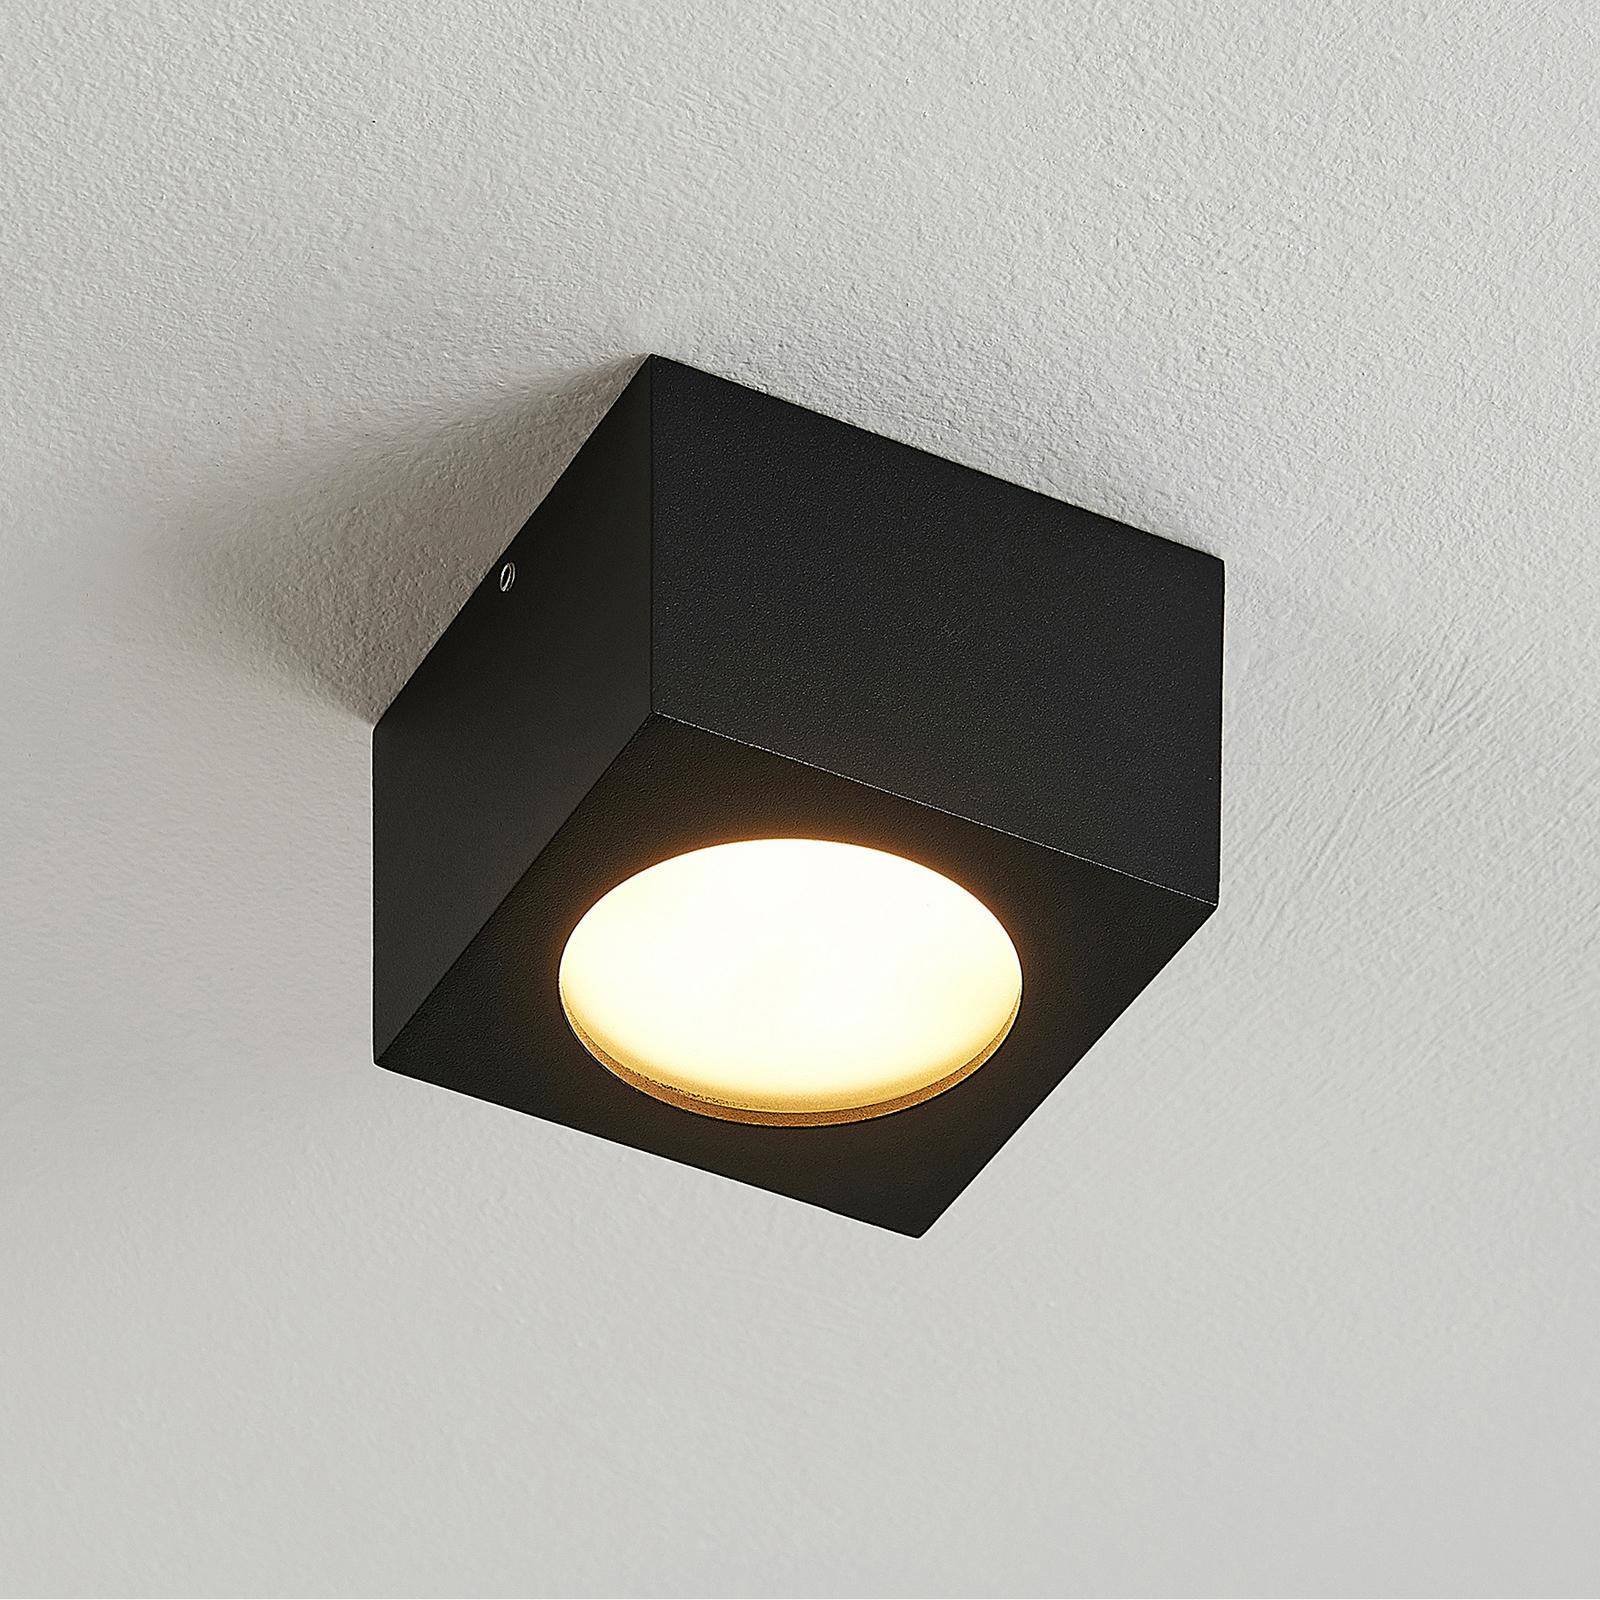 Arcchio Nieva Downlight, GX53, eckig, schwarz